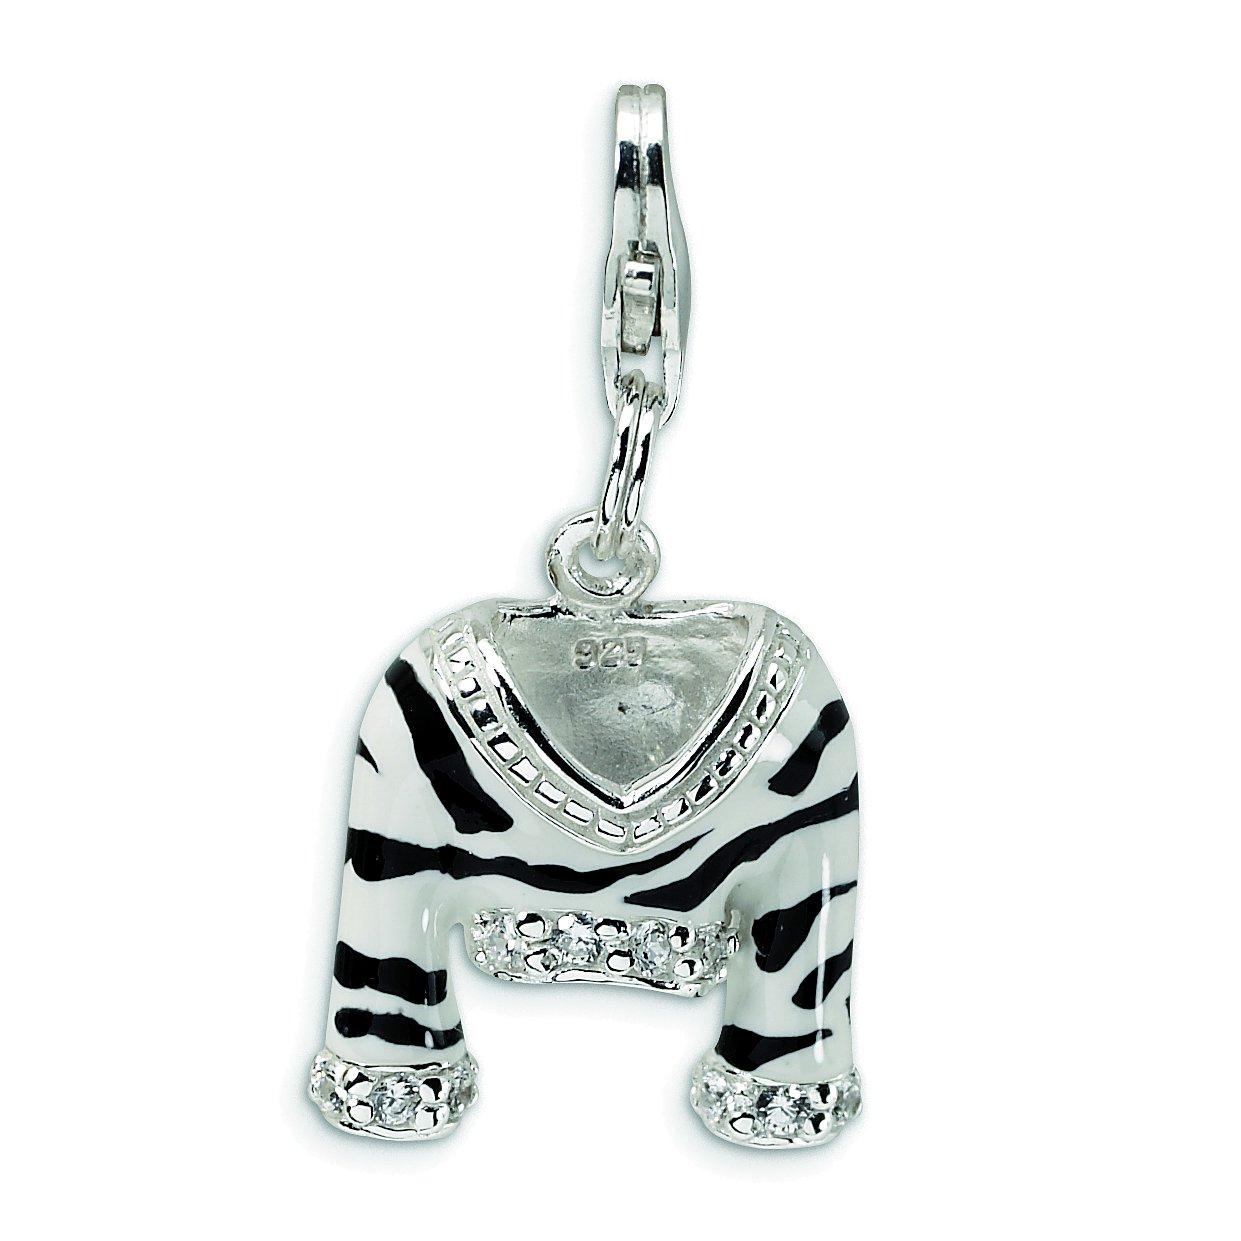 Amore La Vita Sterling Silver CZ Polished Enameled Zebra Jacket with Lobster Clasp Charm